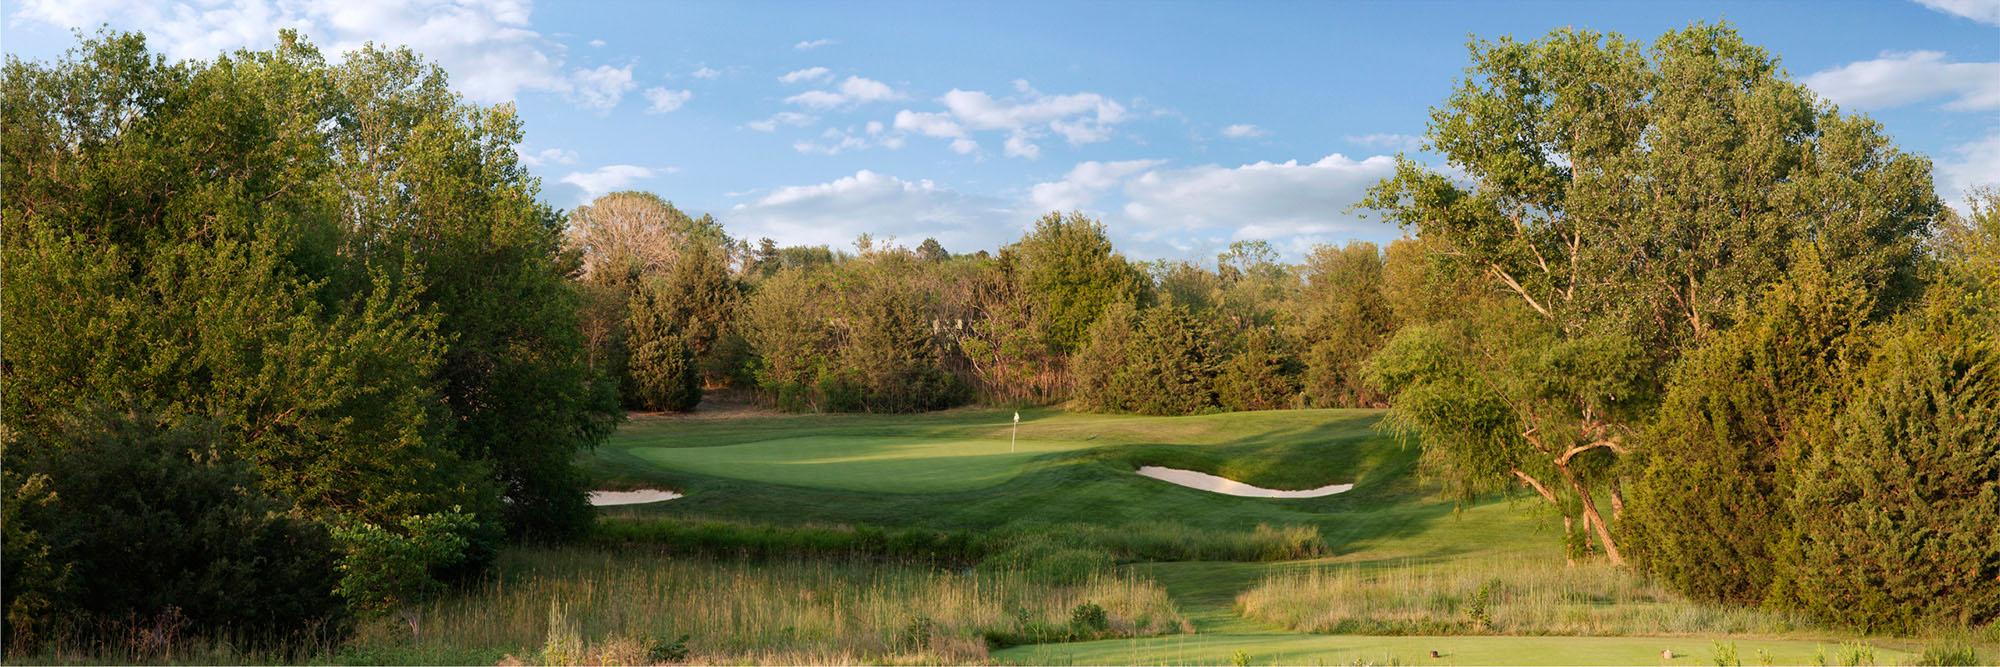 Golf Course Image - Flint Hills National Golf Club No. 4